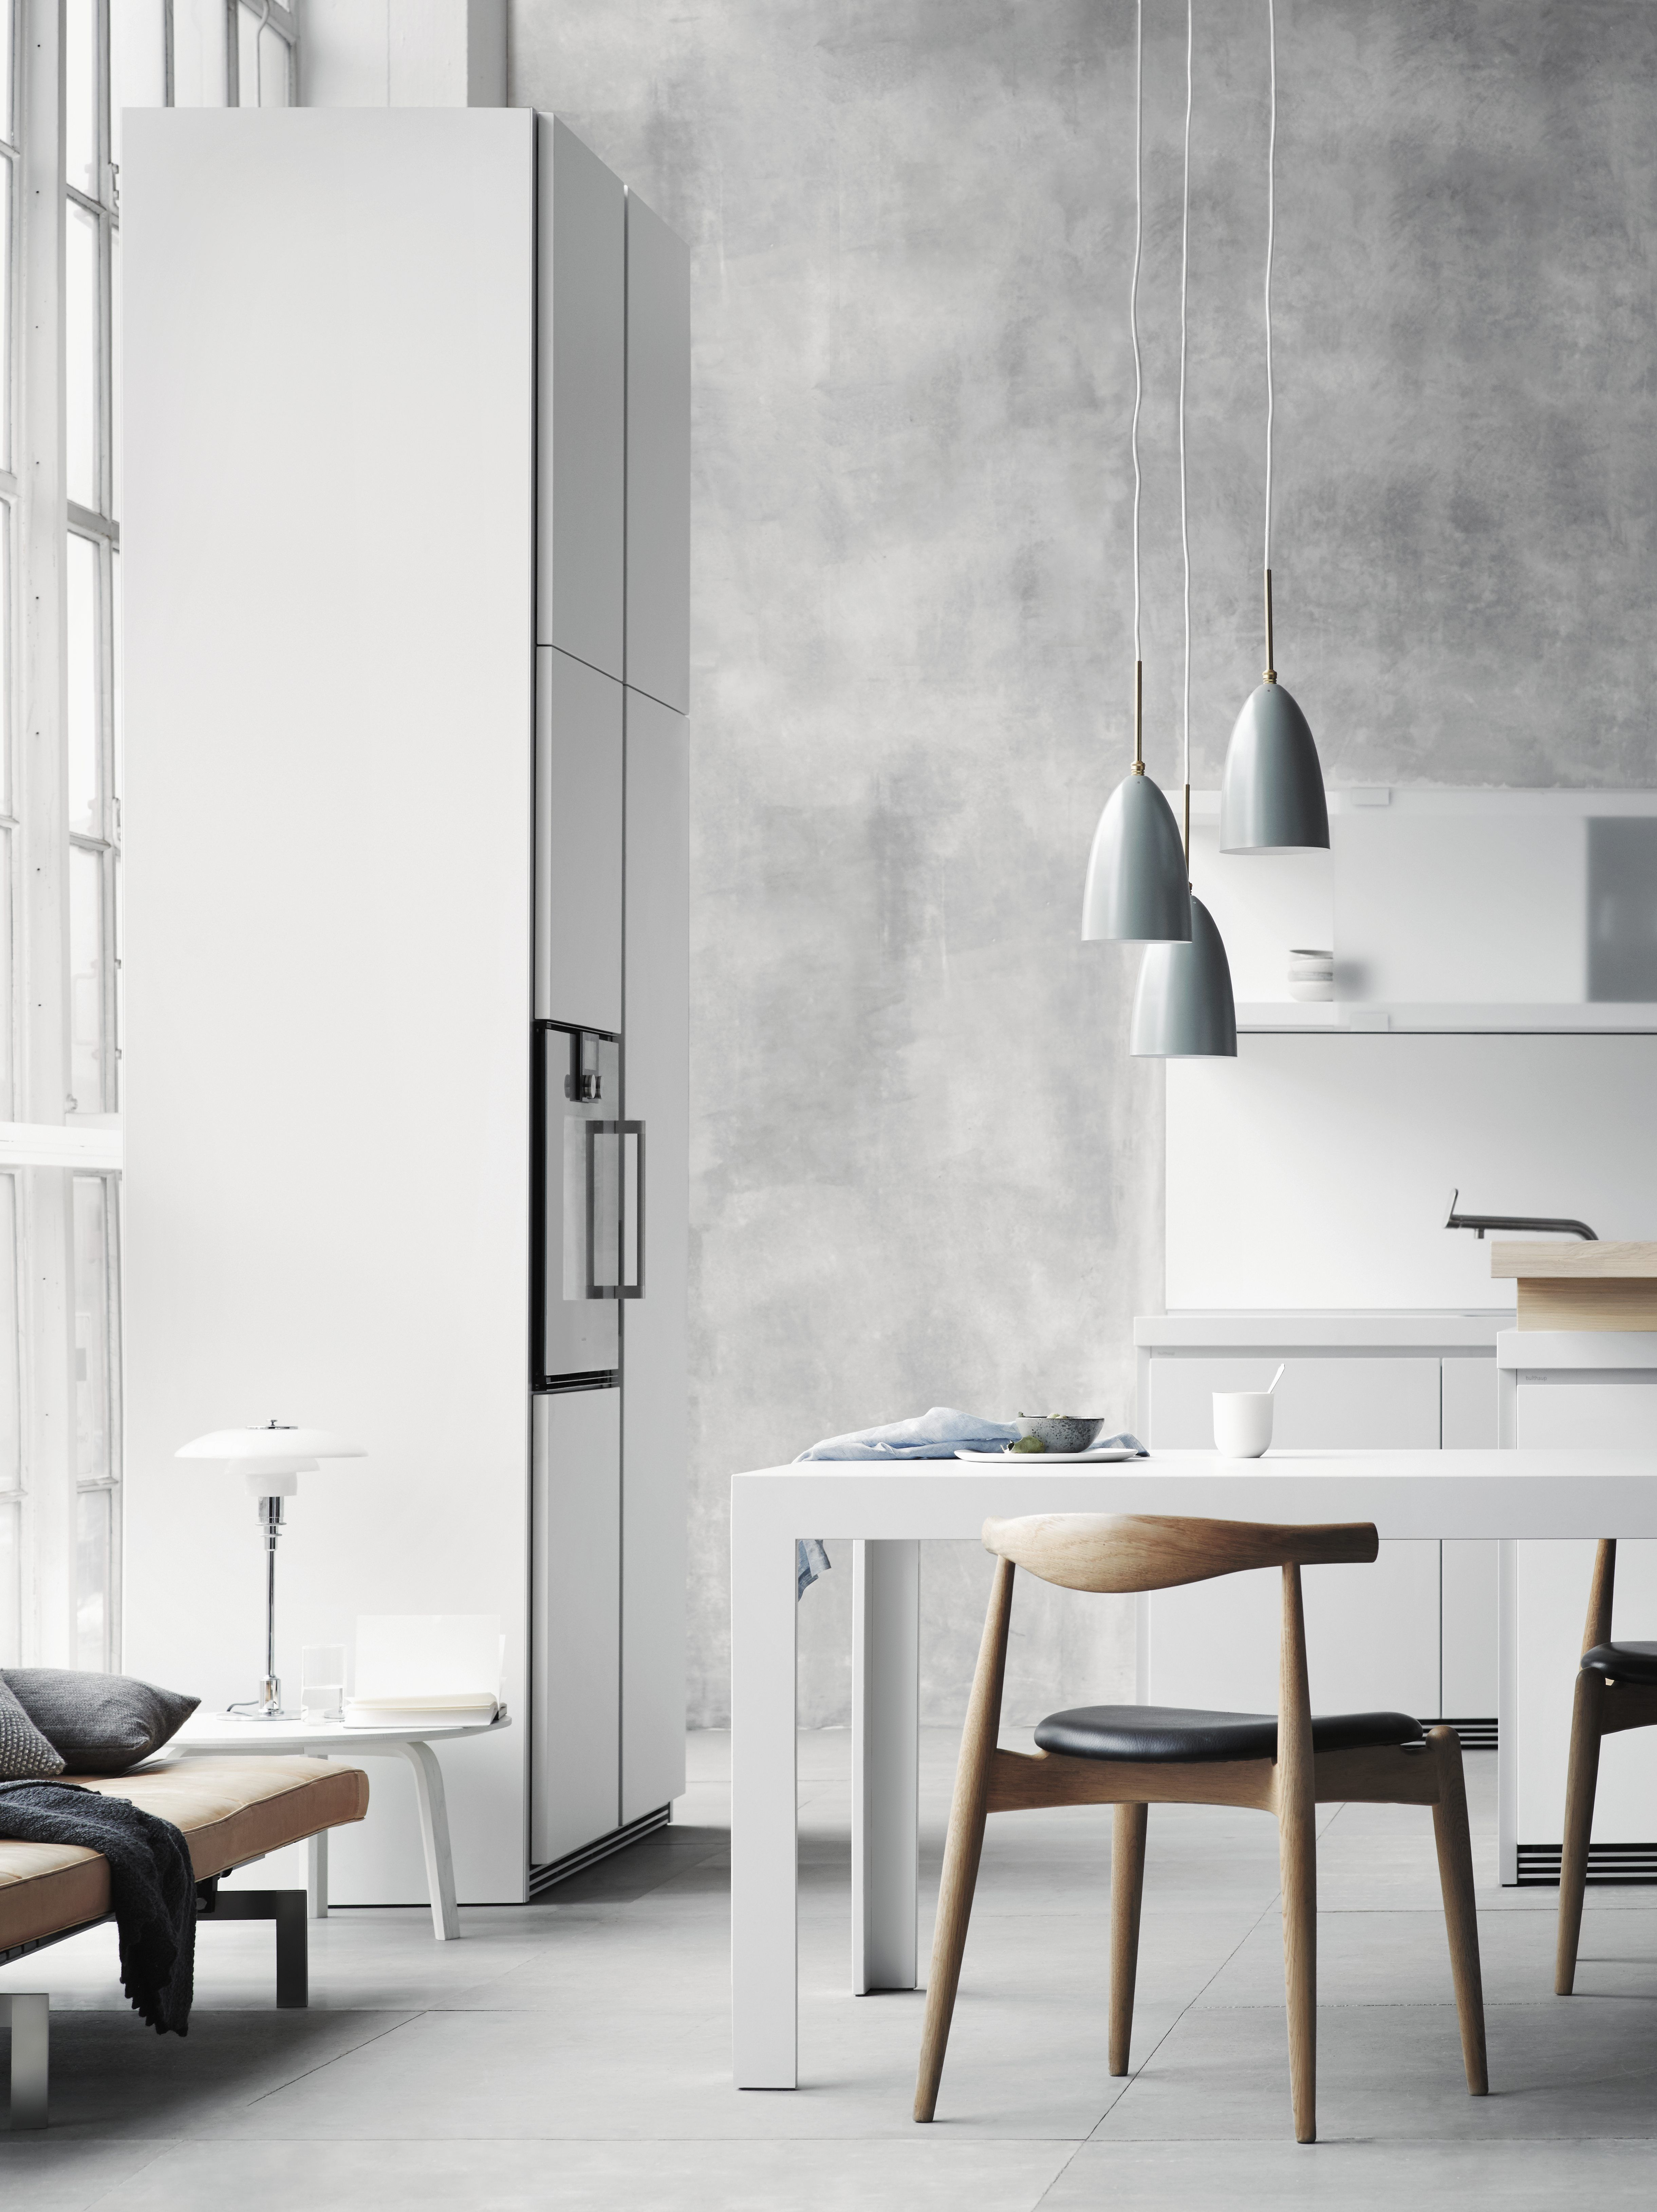 bulthaup b1 copenhagen bulthaup c2 table carl hansen. Black Bedroom Furniture Sets. Home Design Ideas